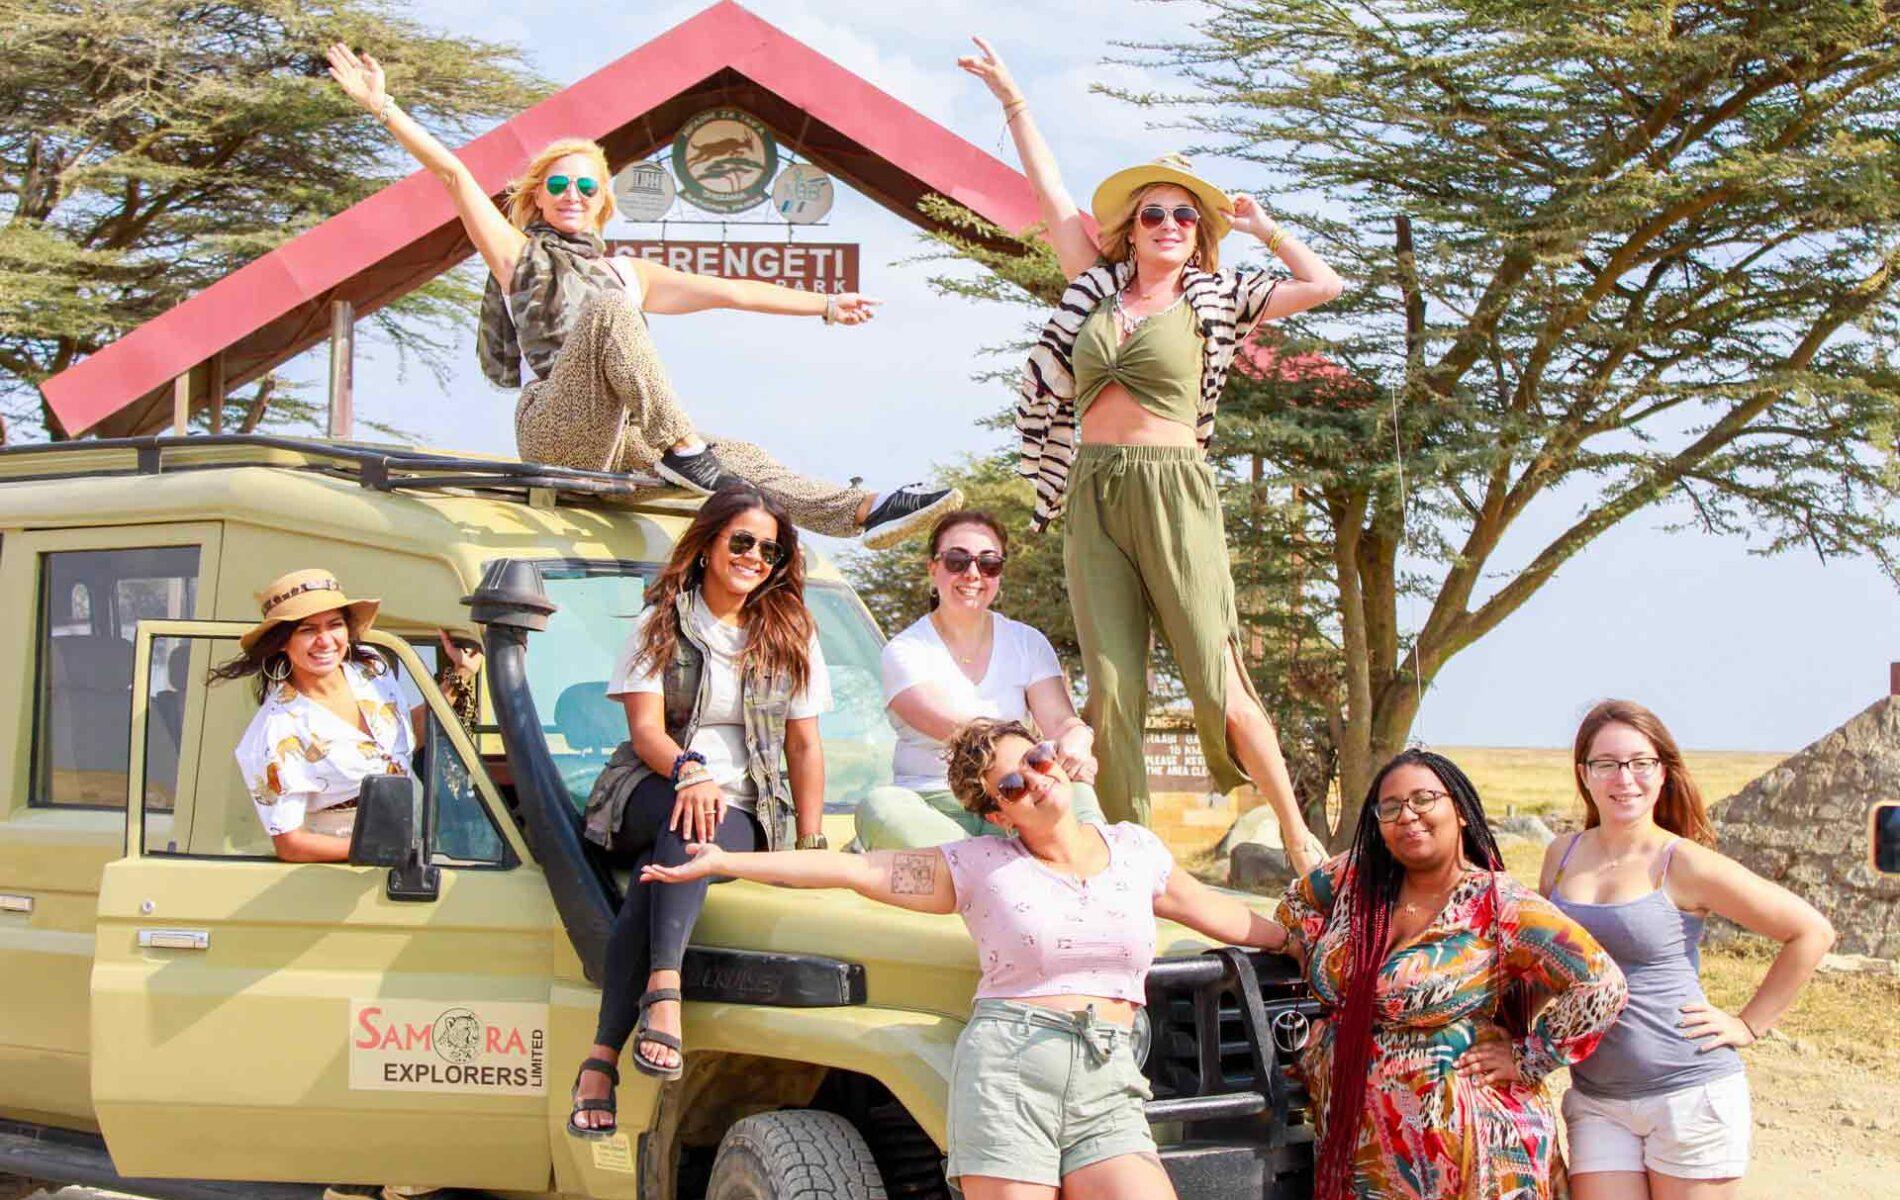 Group-Safari-to-Serengeti-National-Park-with-Samora-Explorers-Ltd-ft-My-Life's-a-Travel-Movie